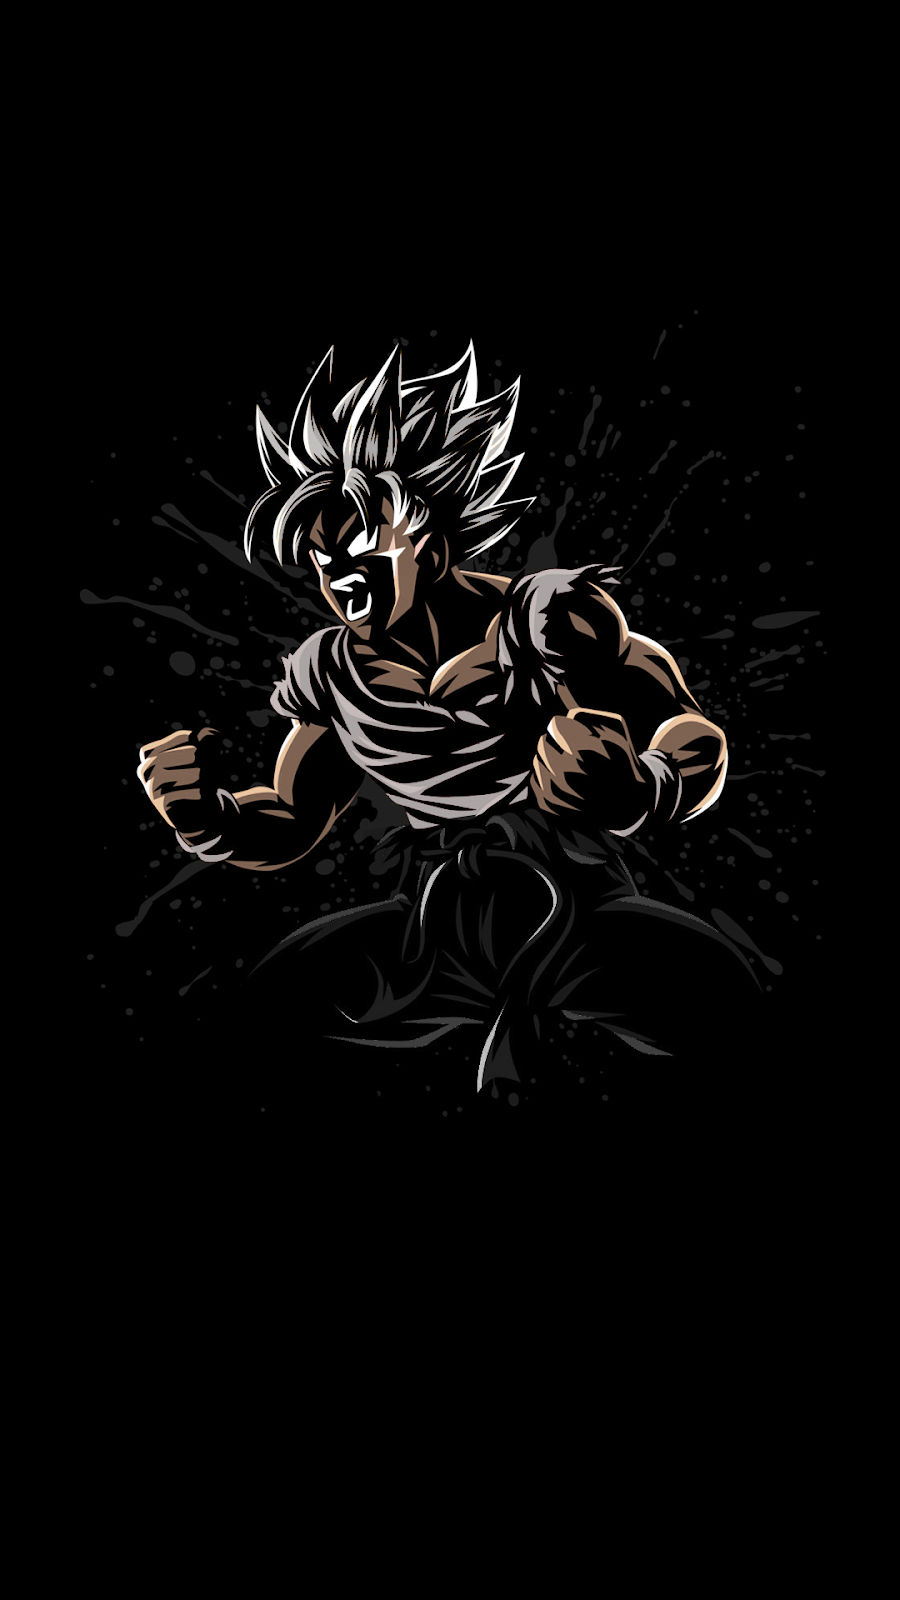 Black Amoled Dragon Ball Wallpapers Top Free Black Amoled Dragon Ball Backgrounds Wallpaperaccess